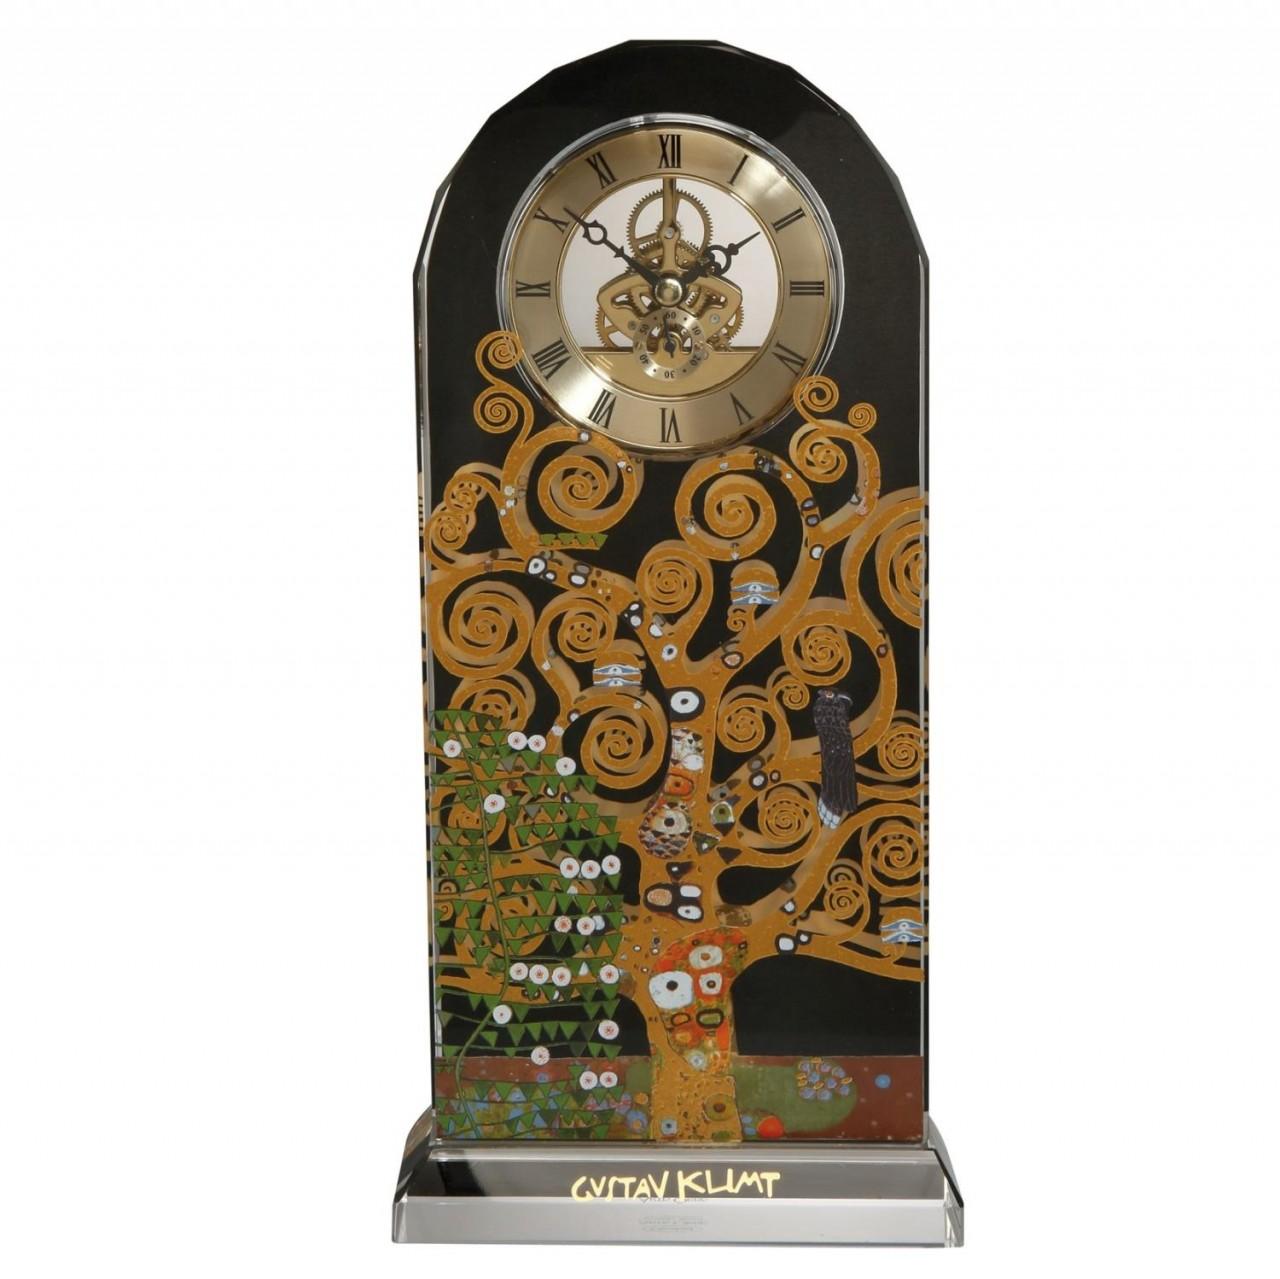 2er Set Gustav Klimt Sektglas Der Lebensbaum H 26cm 200ml Goebel